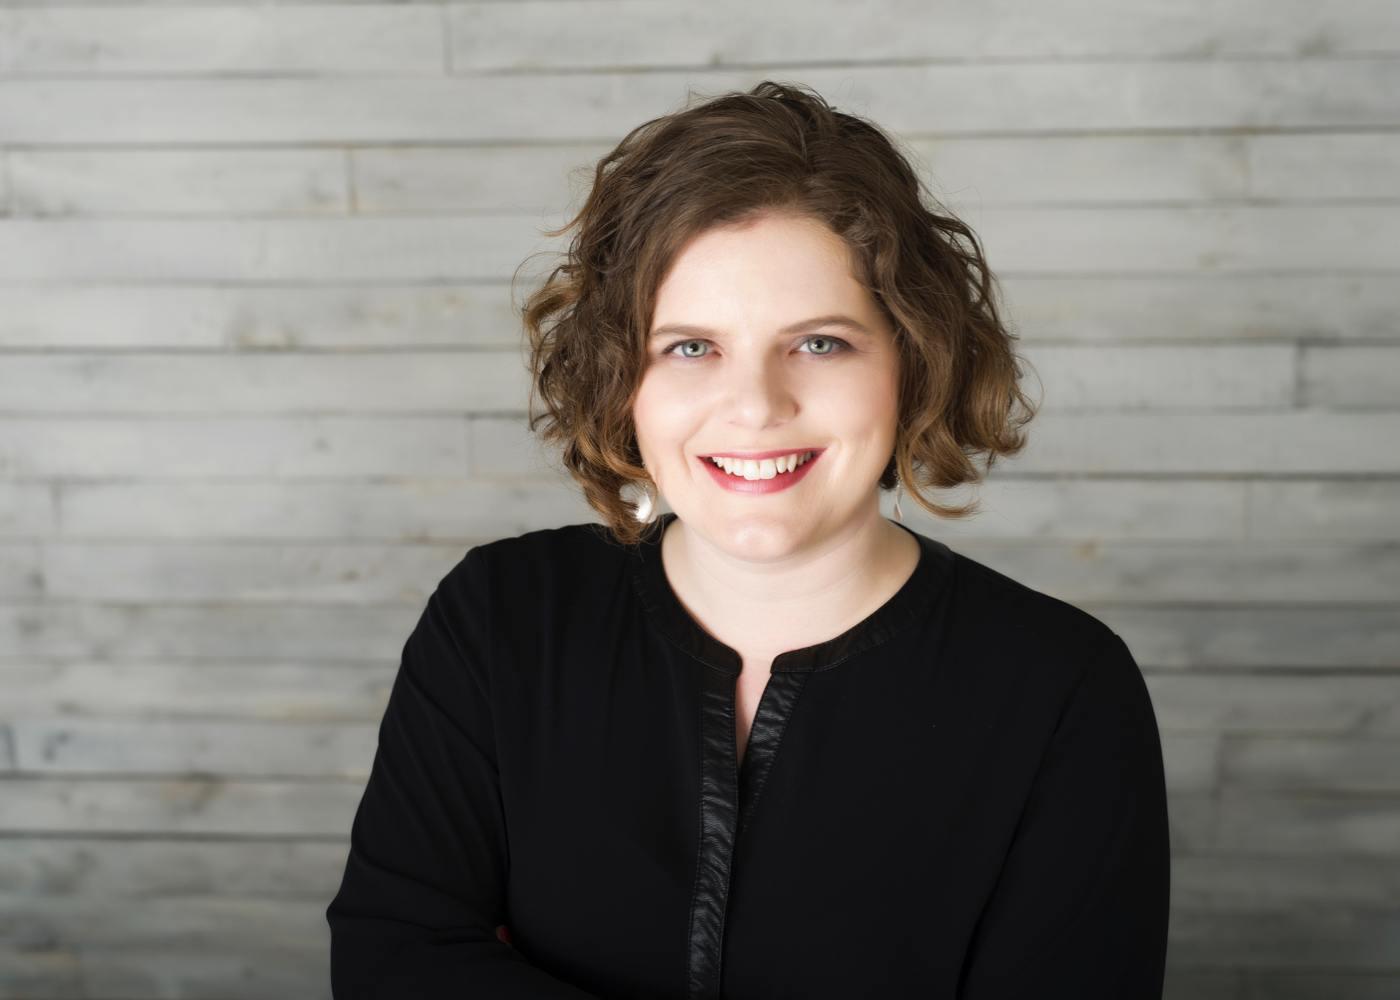 Stefanie Wager, creator of this teacher fellowships list for social studies travel.